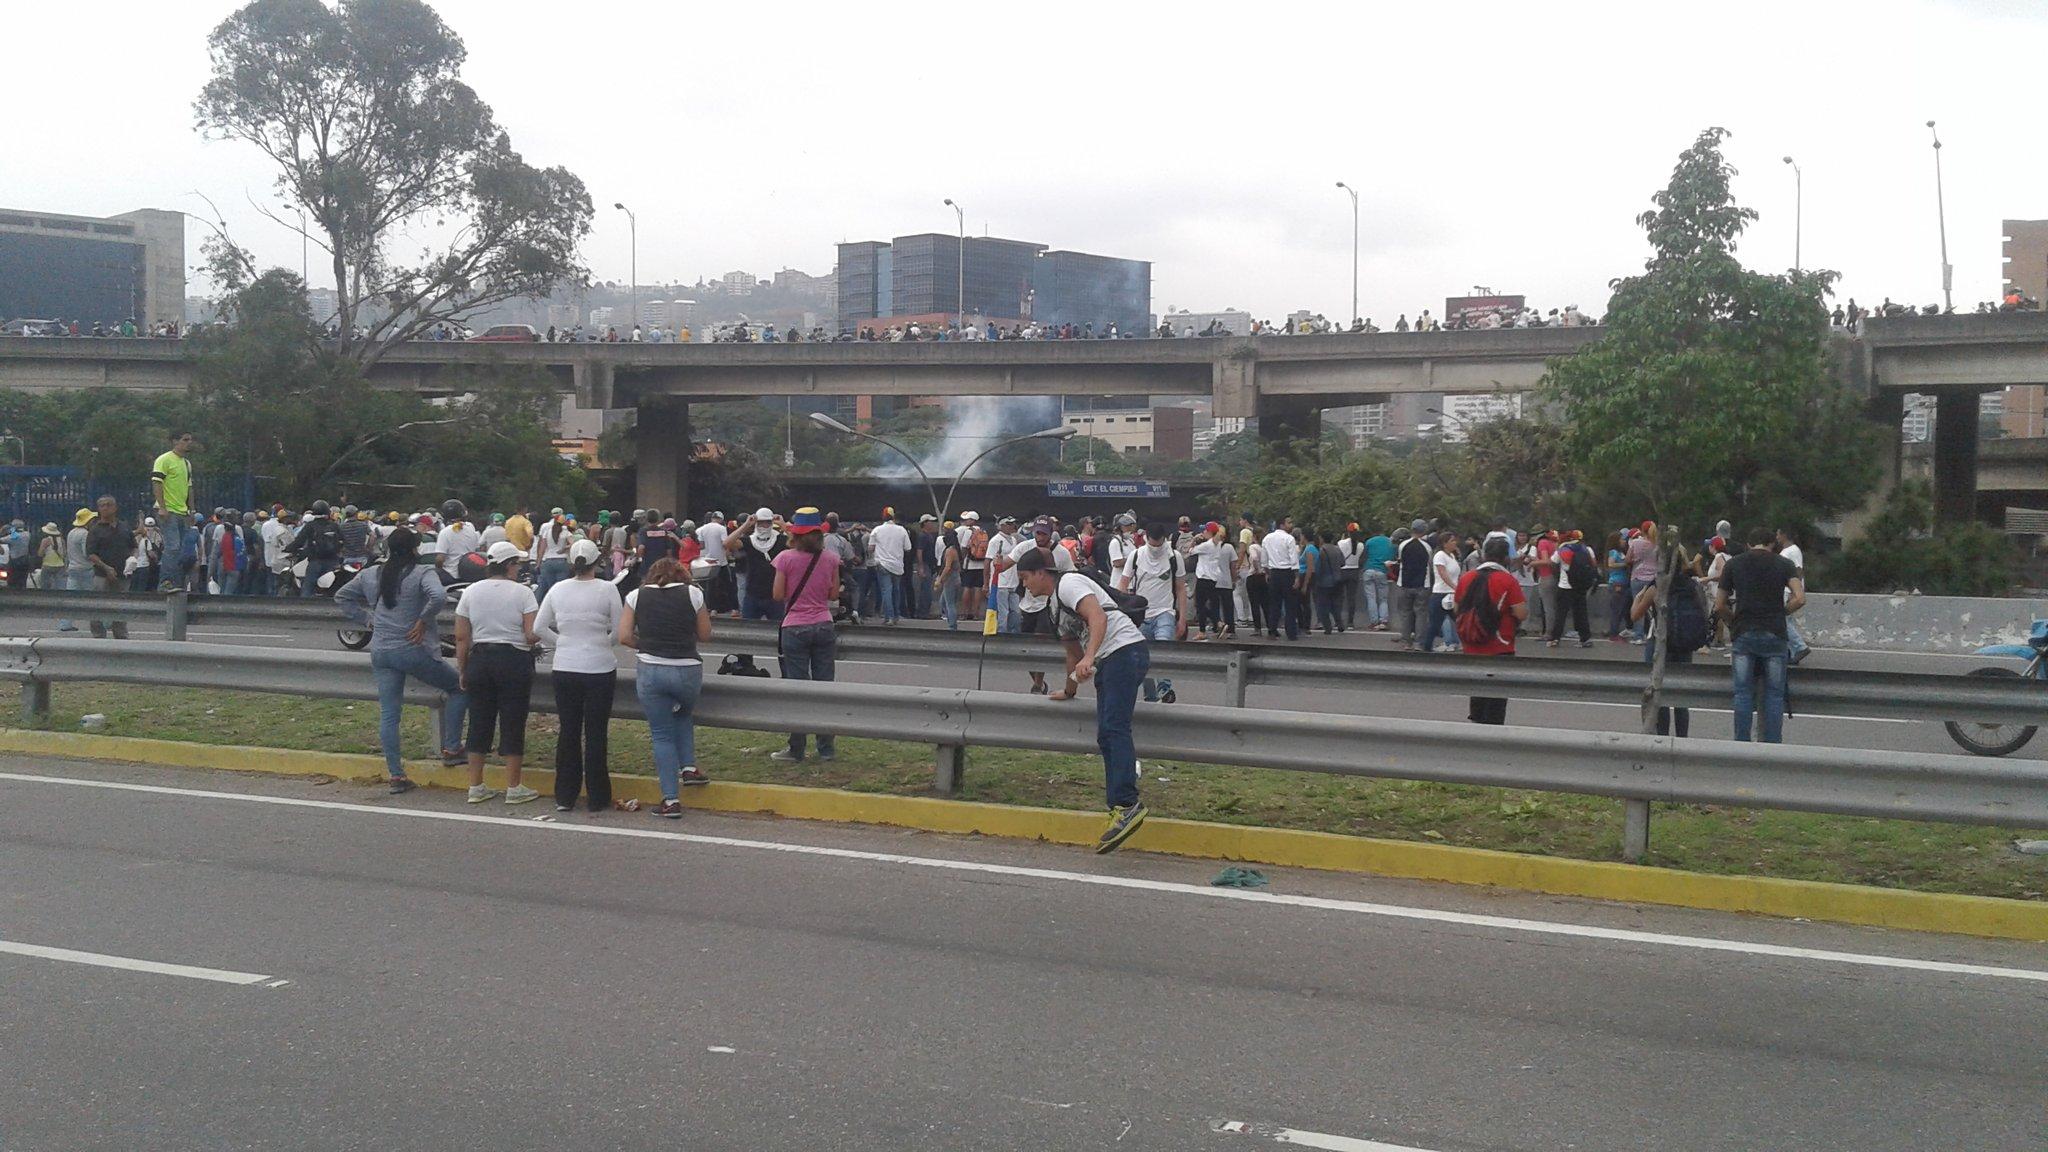 Bombas lacrimógenas en la autopista Francisco Fajardo, altura Dist. Ciempies https://t.co/5wmuzrAh36